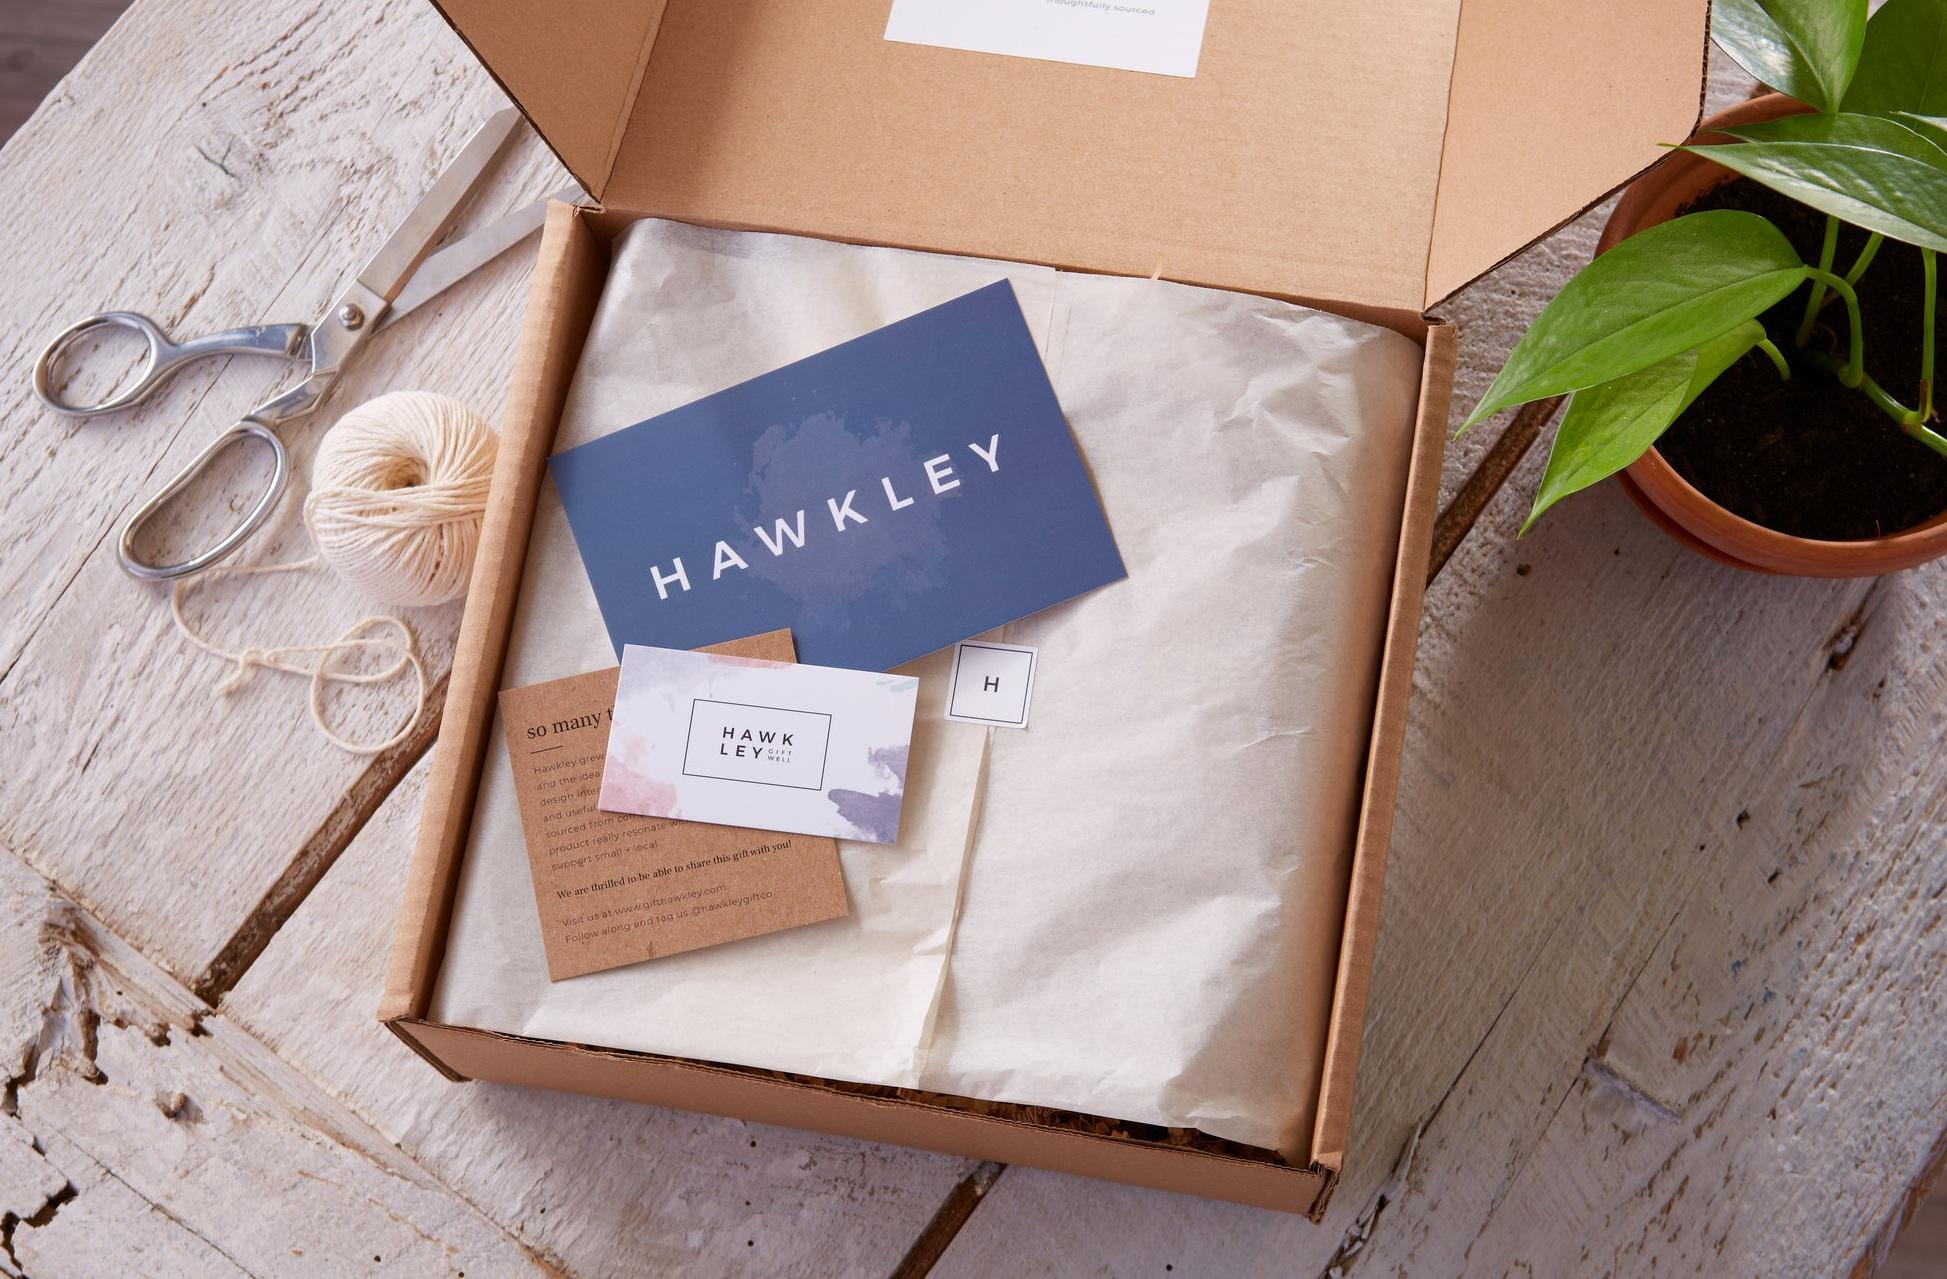 Hawkley_12-15-18 139638.jpg